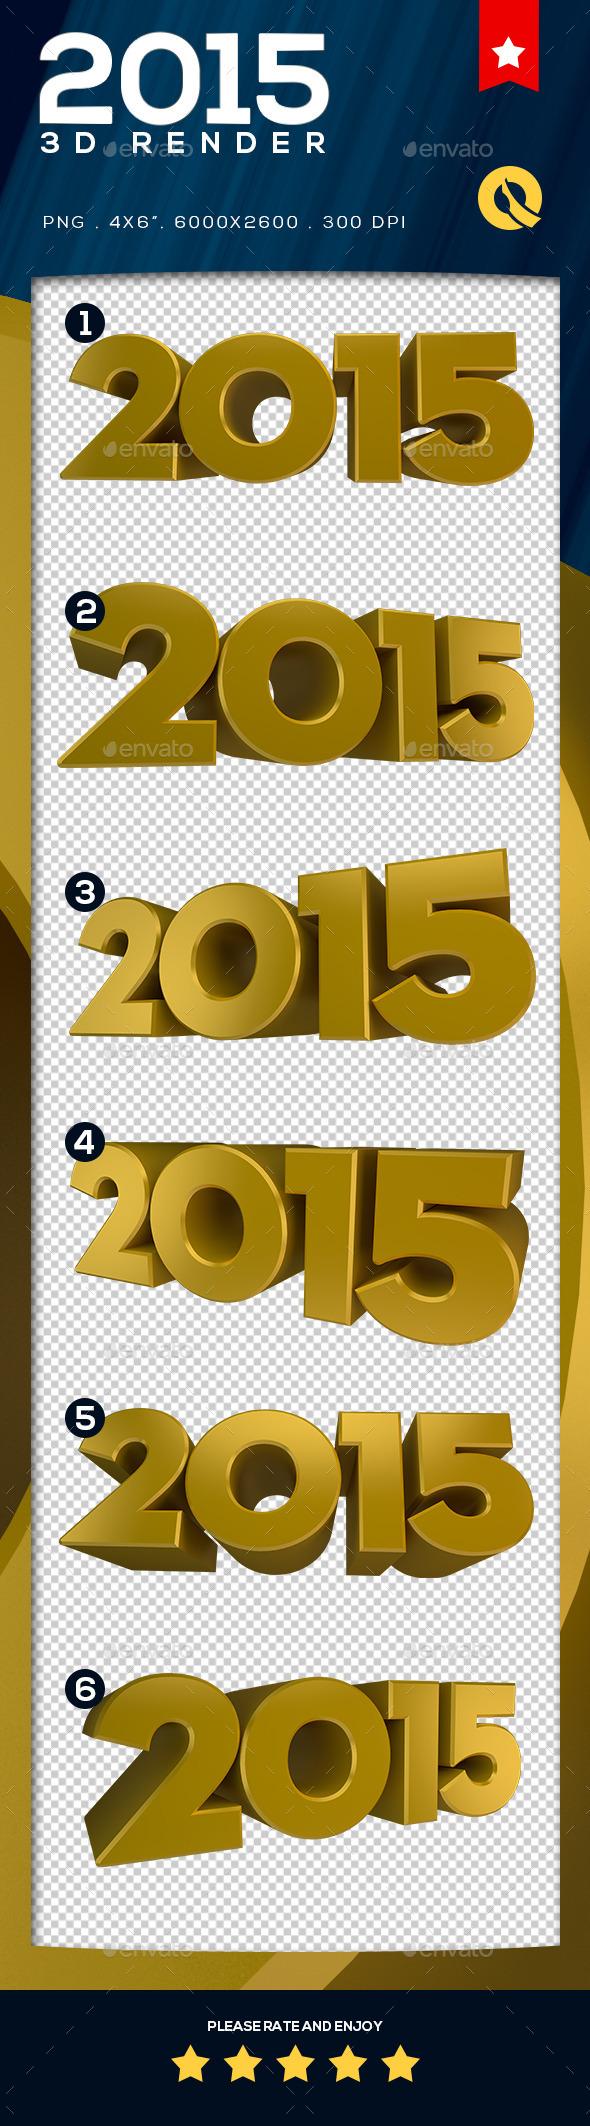 2015 3D Render - Text 3D Renders